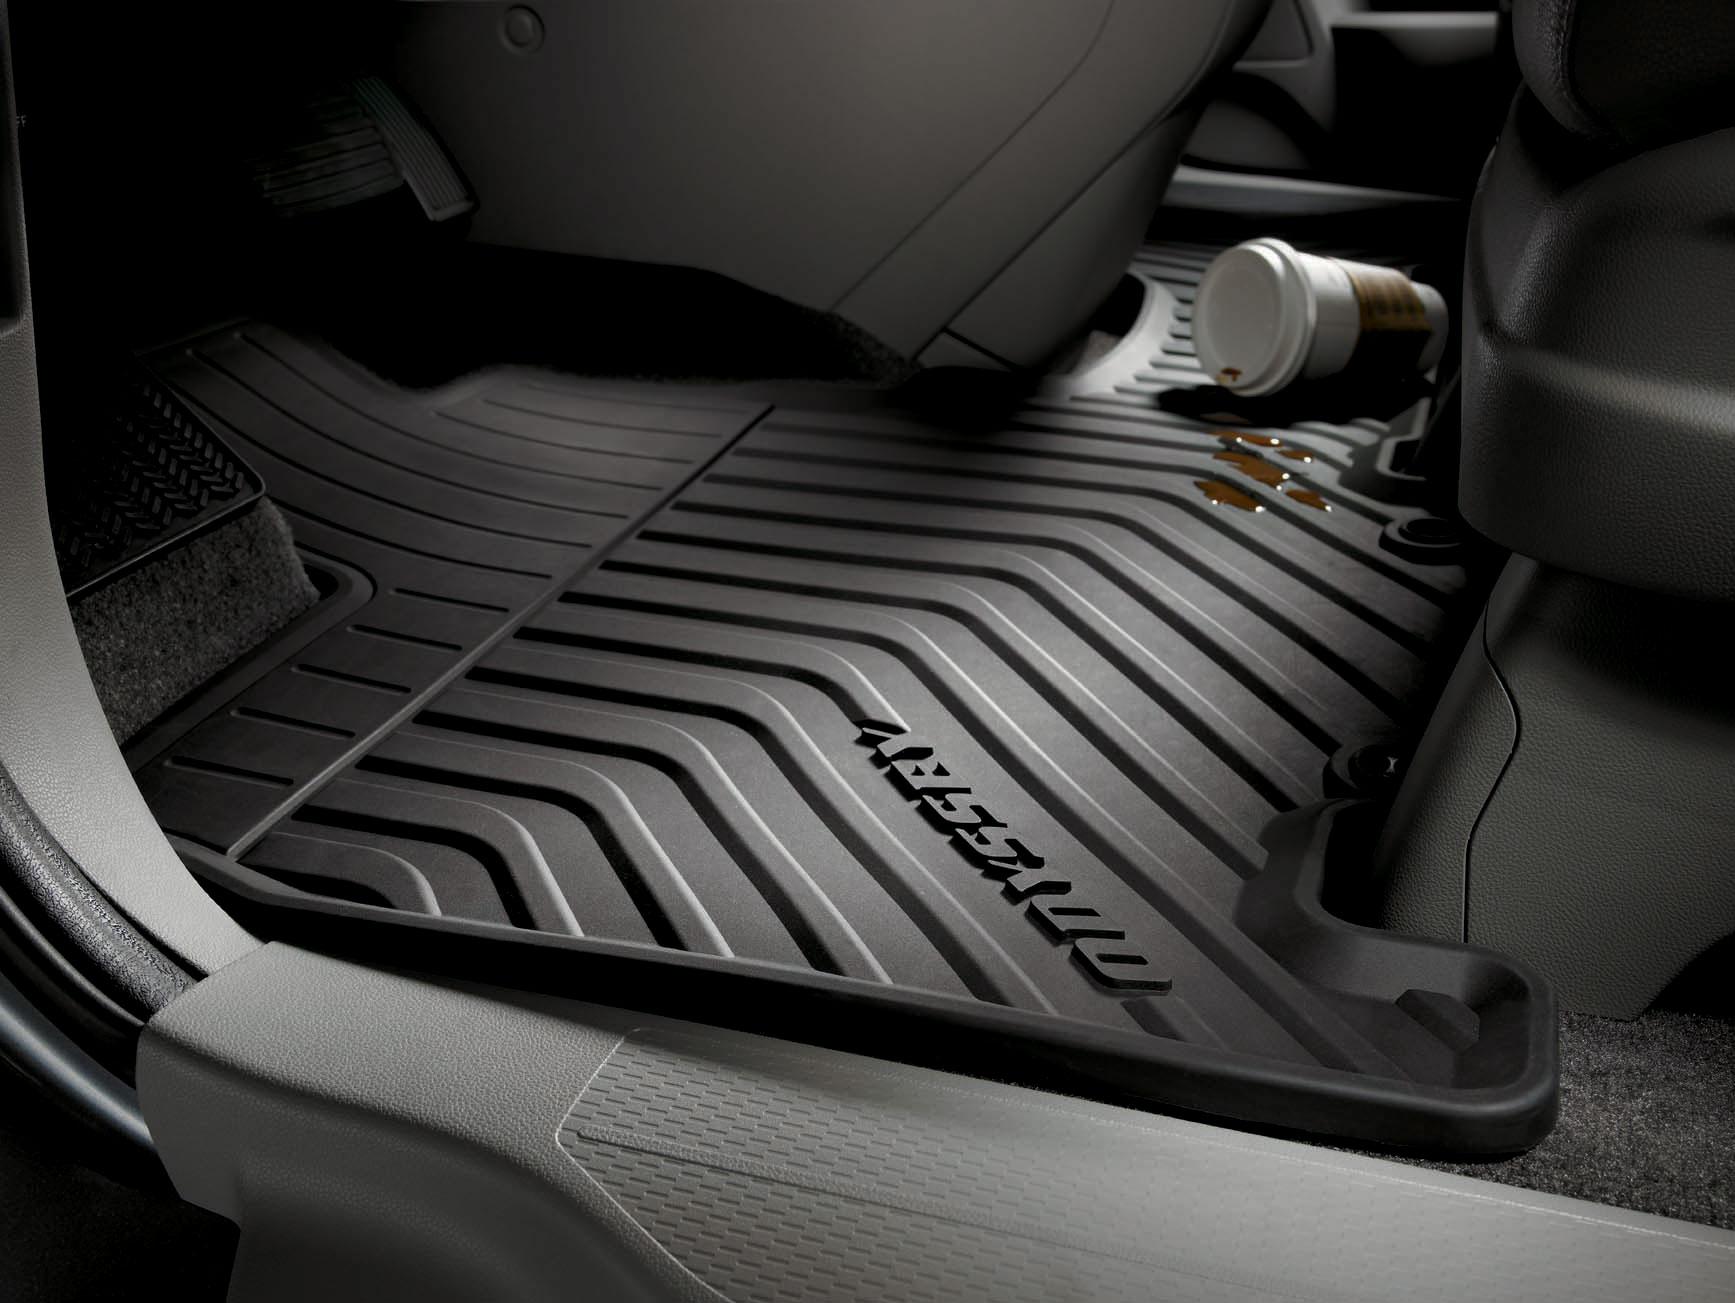 Floor mats odyssey - All Season Floor Mats Odyssey Click To Enlarge